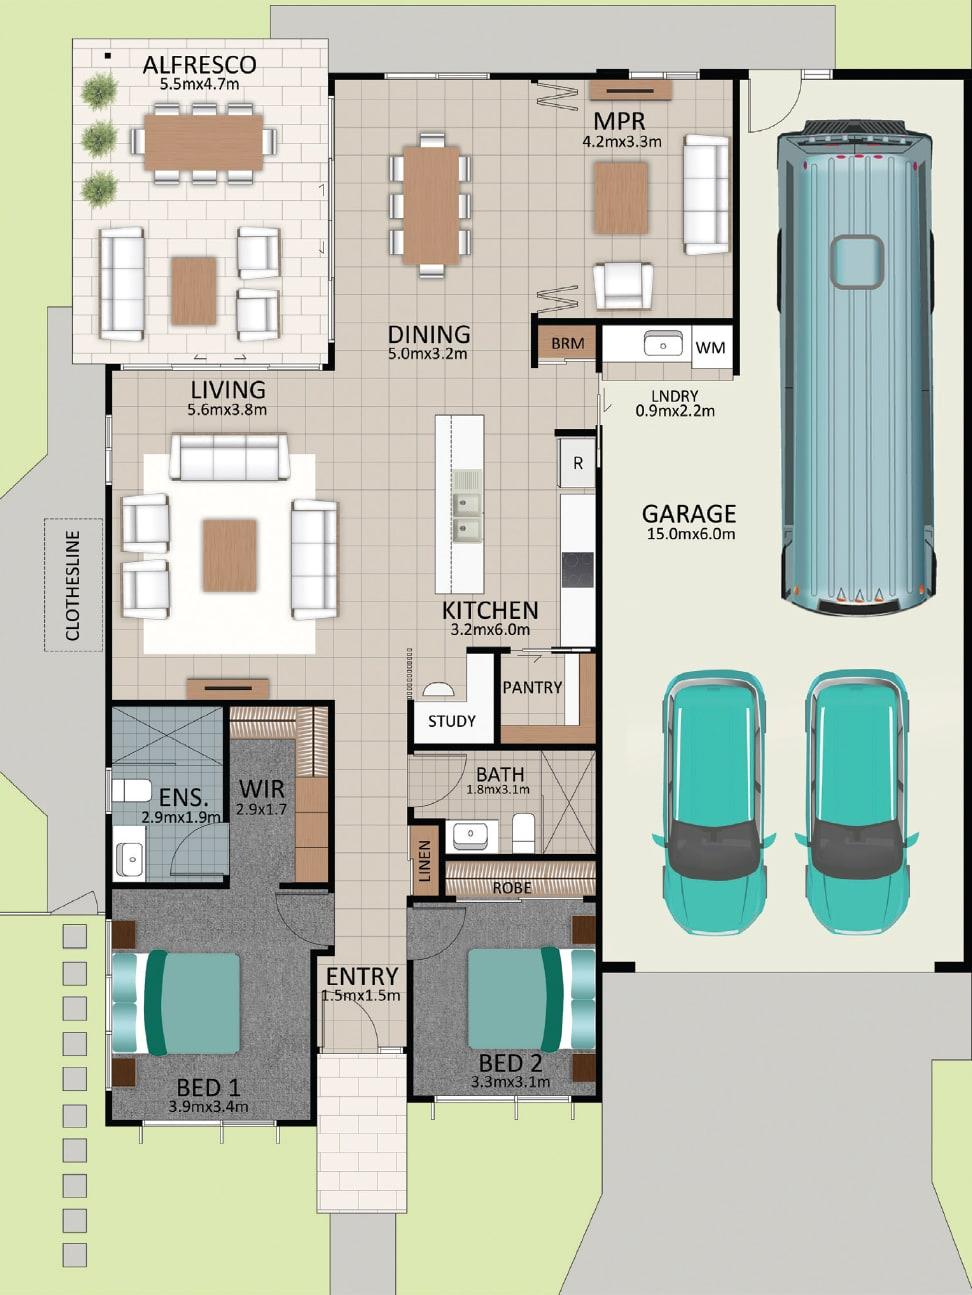 LAT25 Floorplan GAL LOT 225 FEB2021 V1 - Lot 225